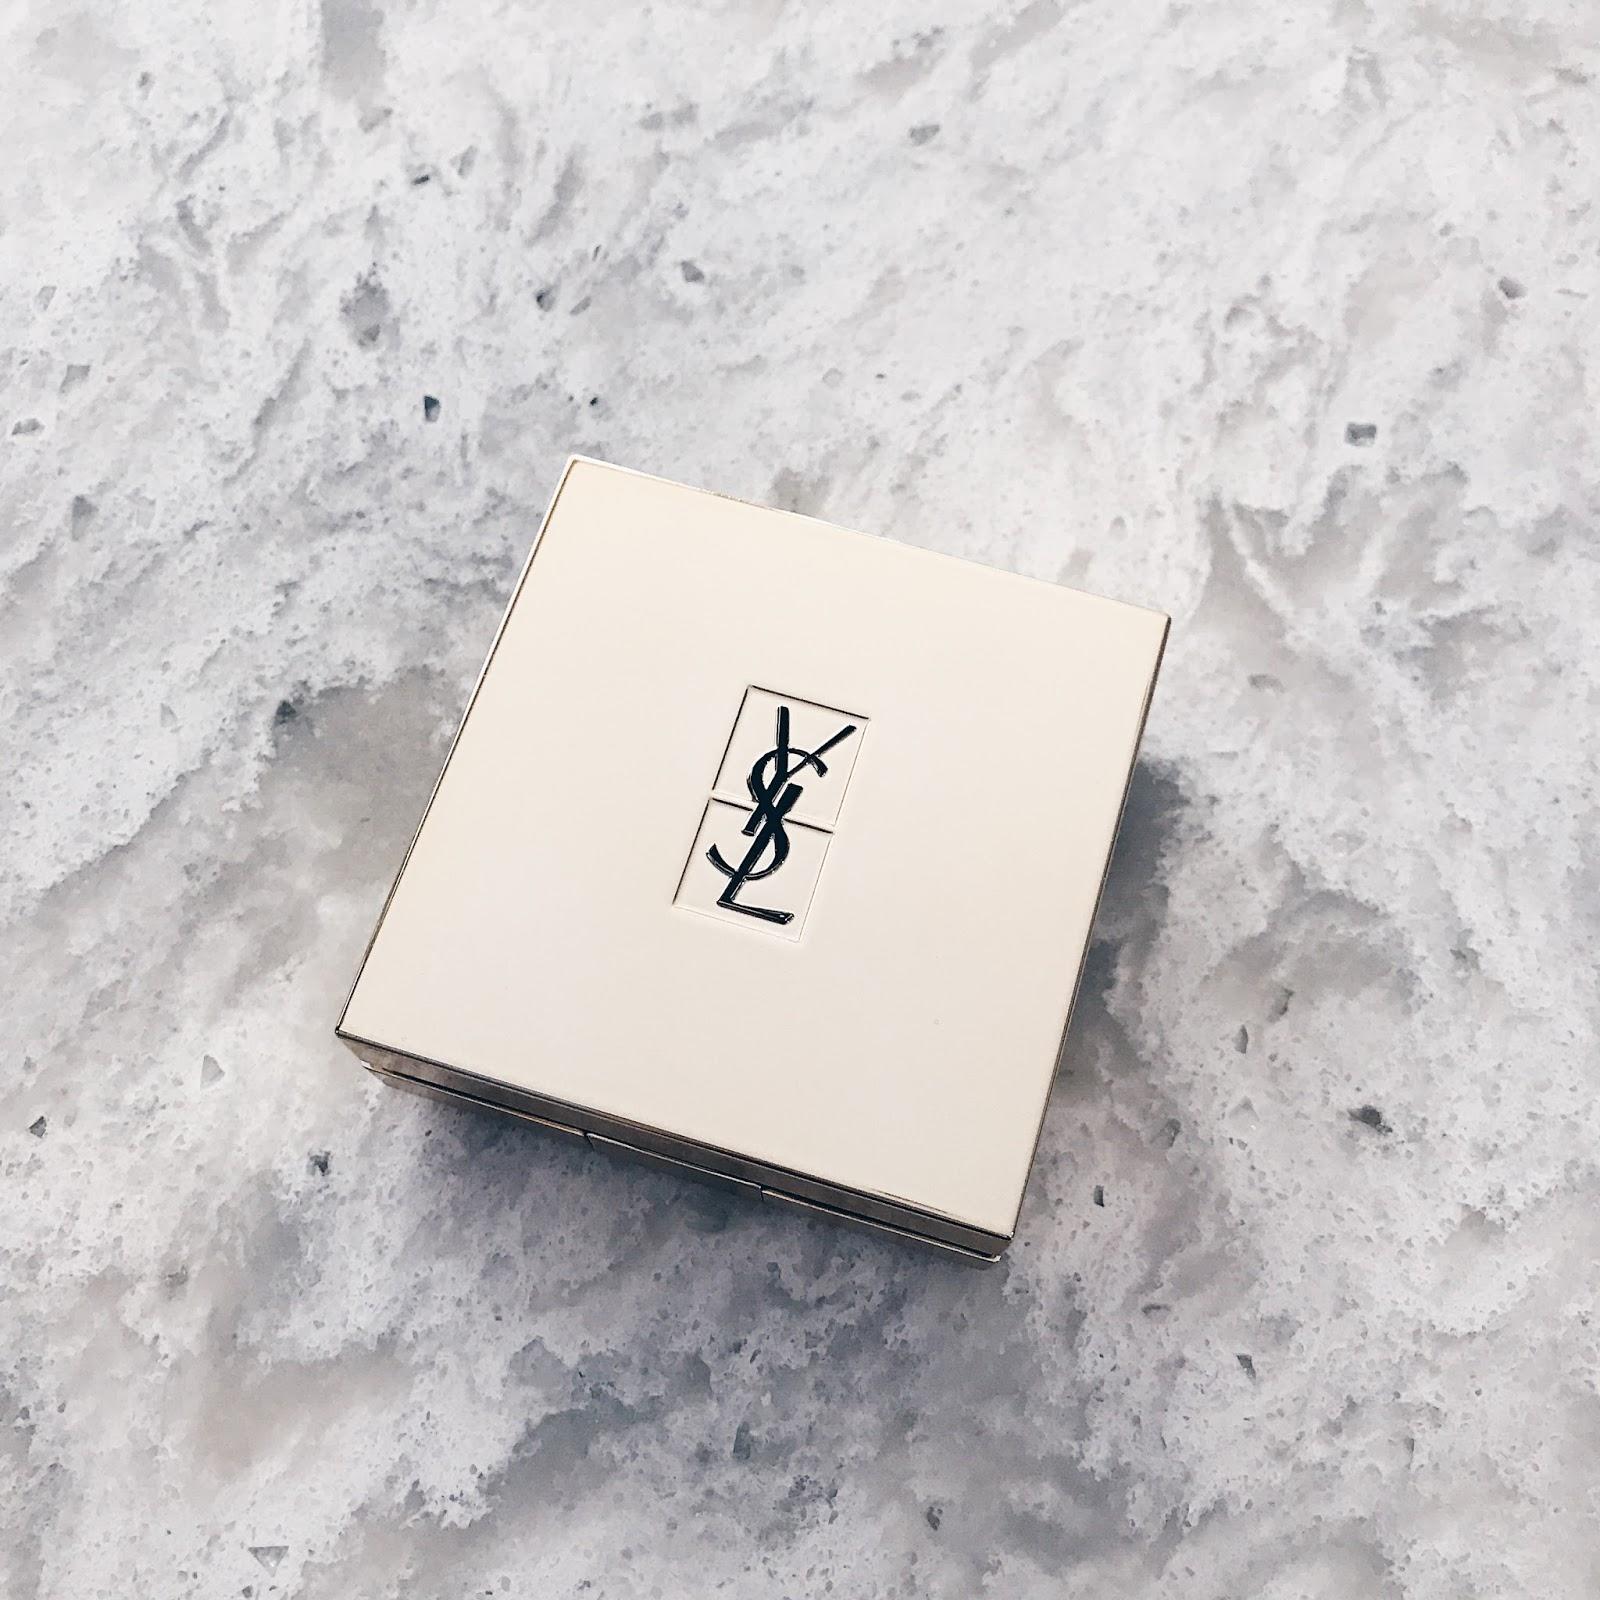 Yves Saint Laurent Touche Eclat Cushion Melissaawongg